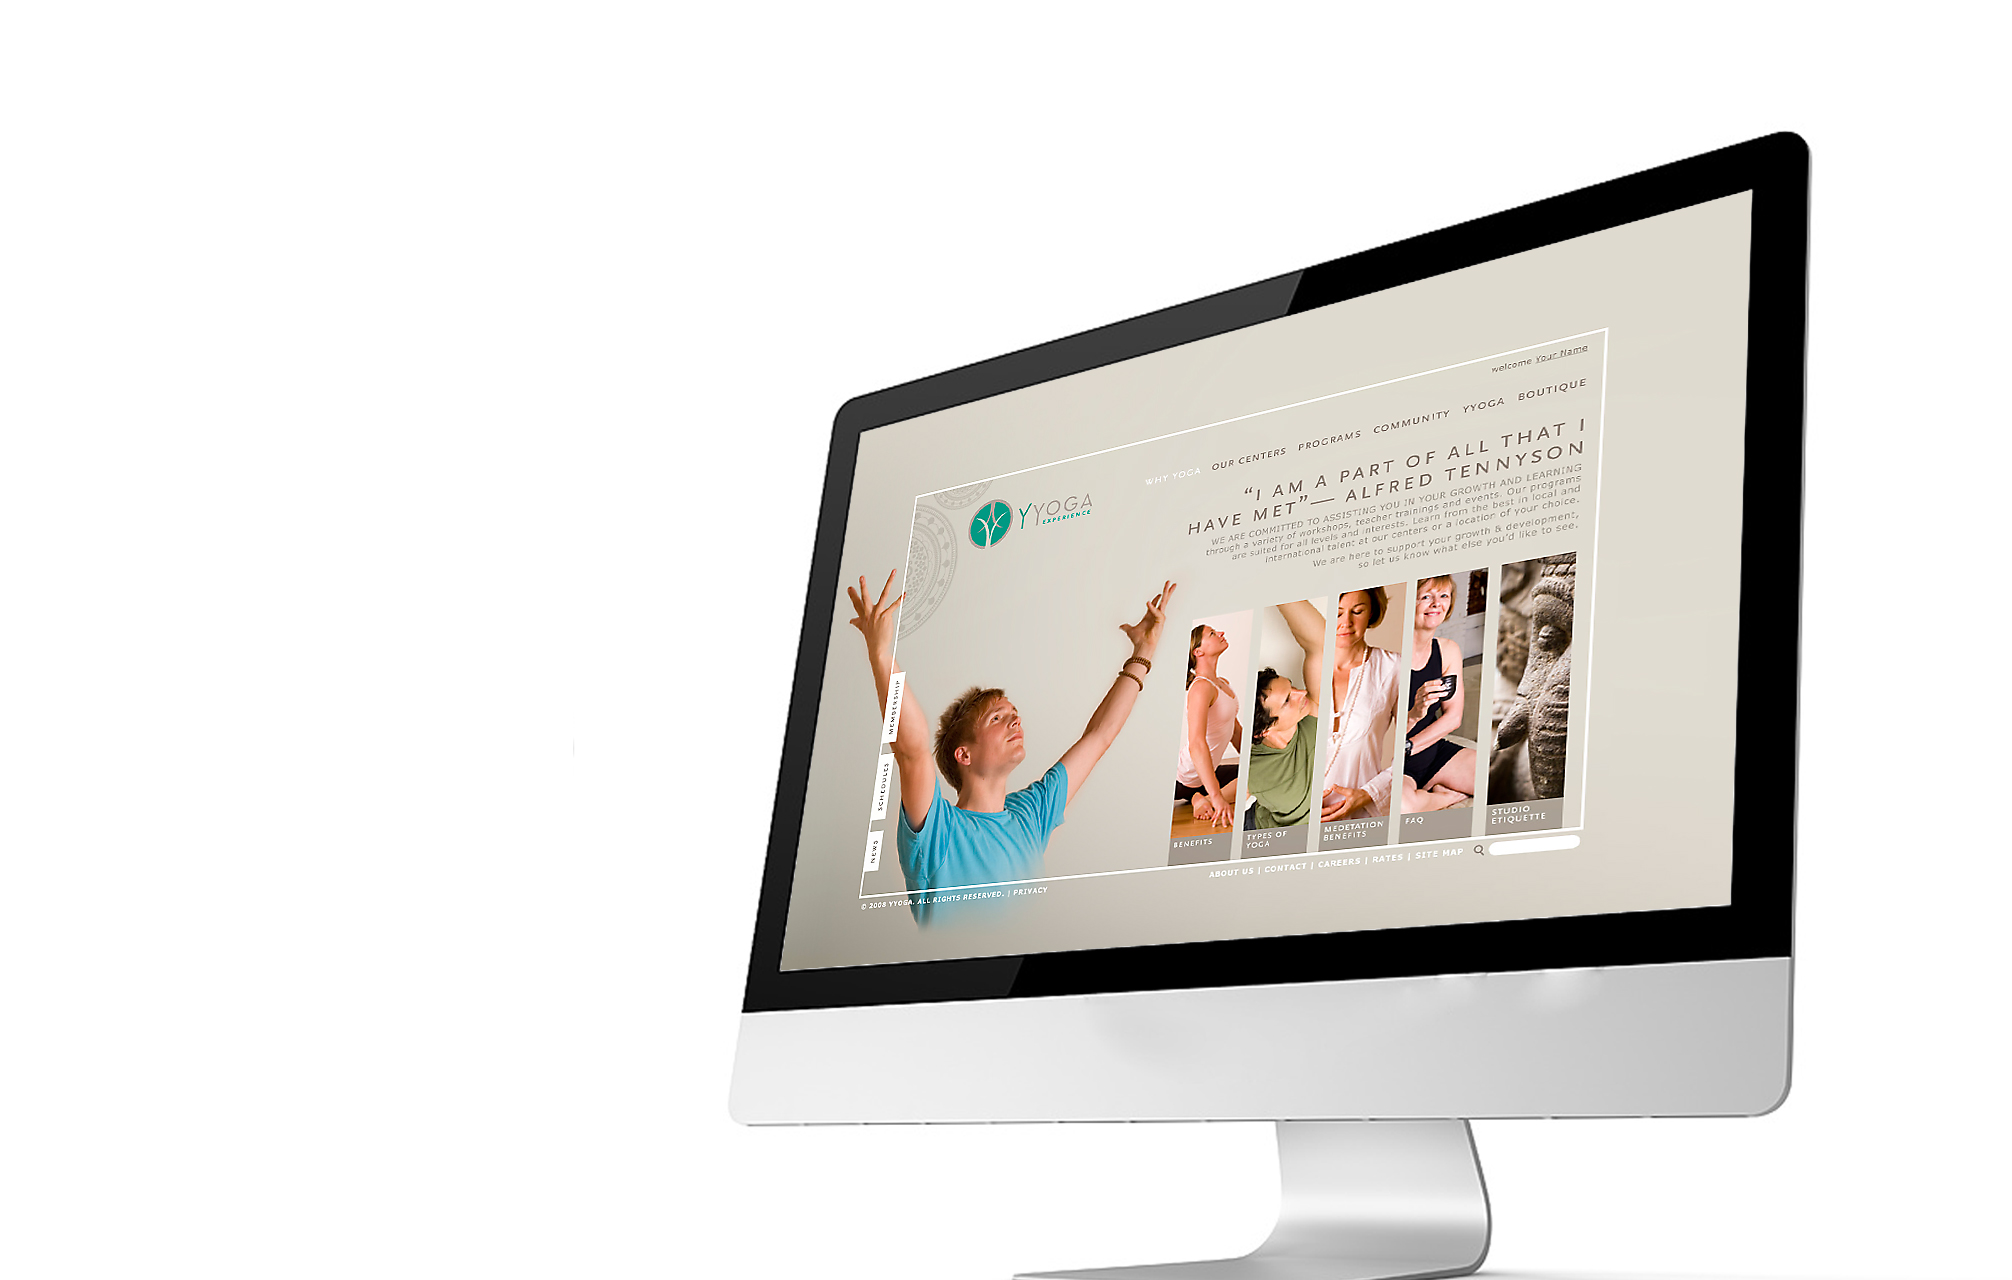 YYOGA / website design /  studio credit :Traction Creative Communications